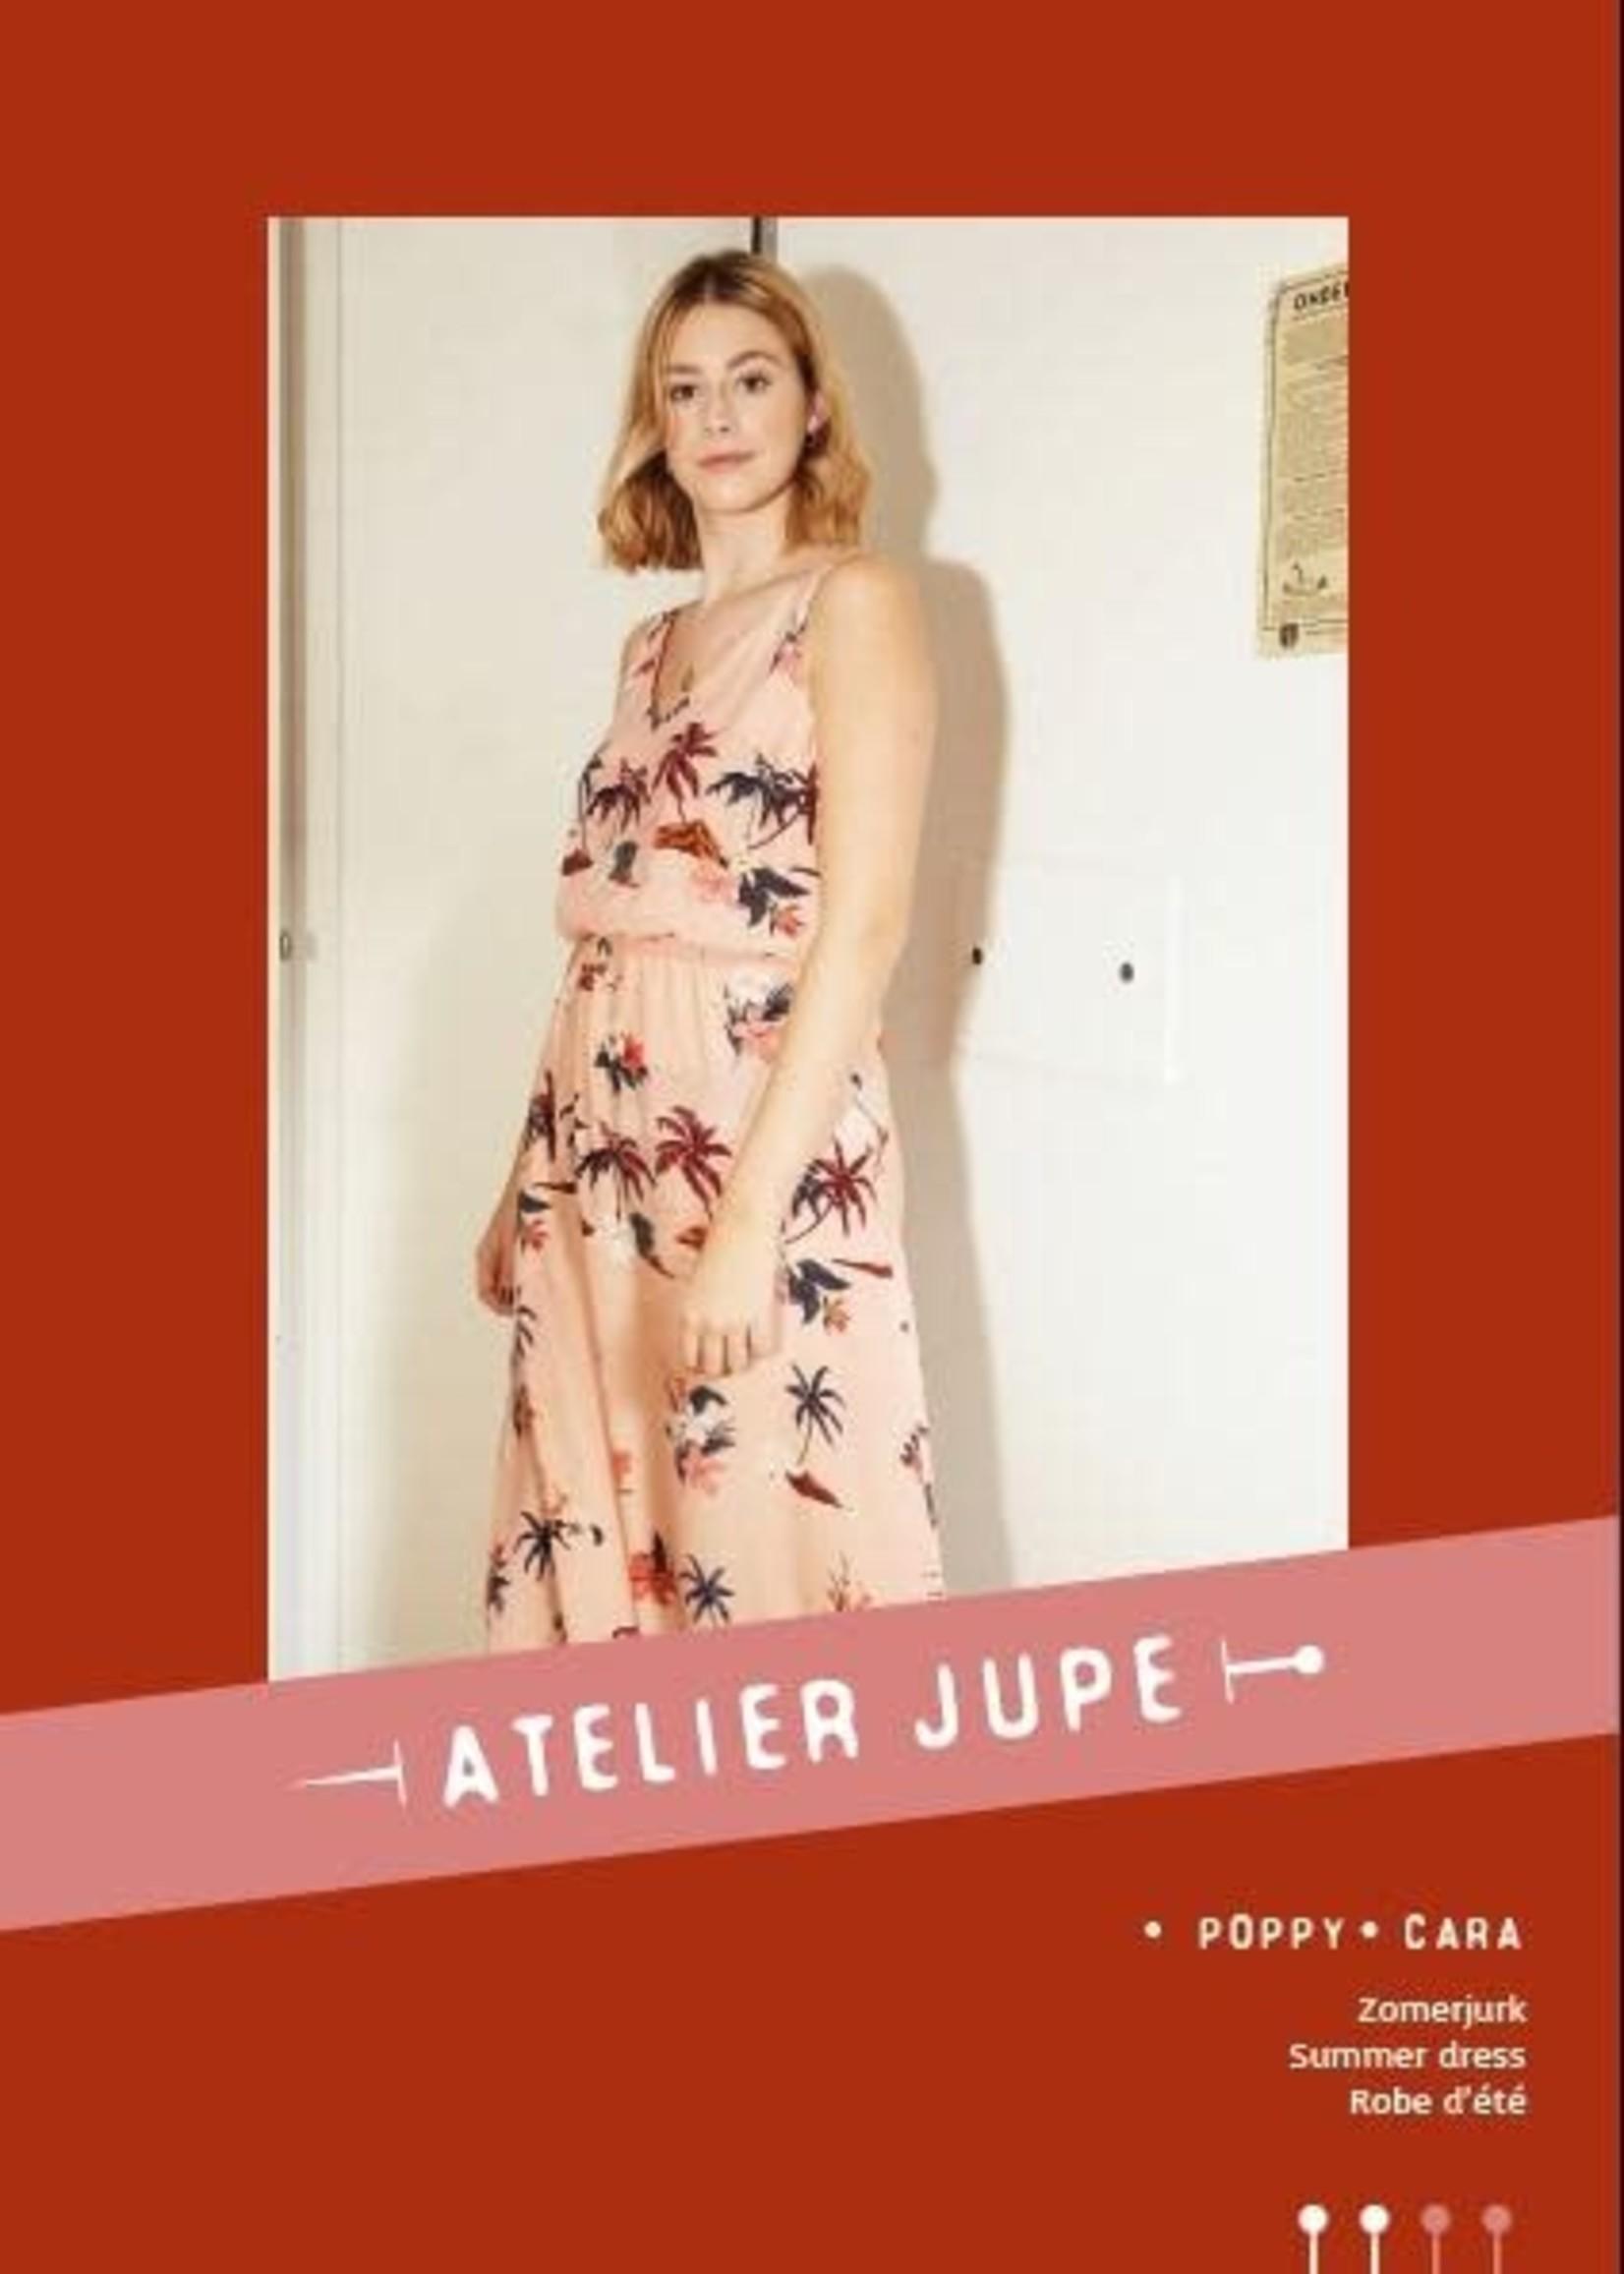 Atelier Jupe Poppy & Cara summer dress